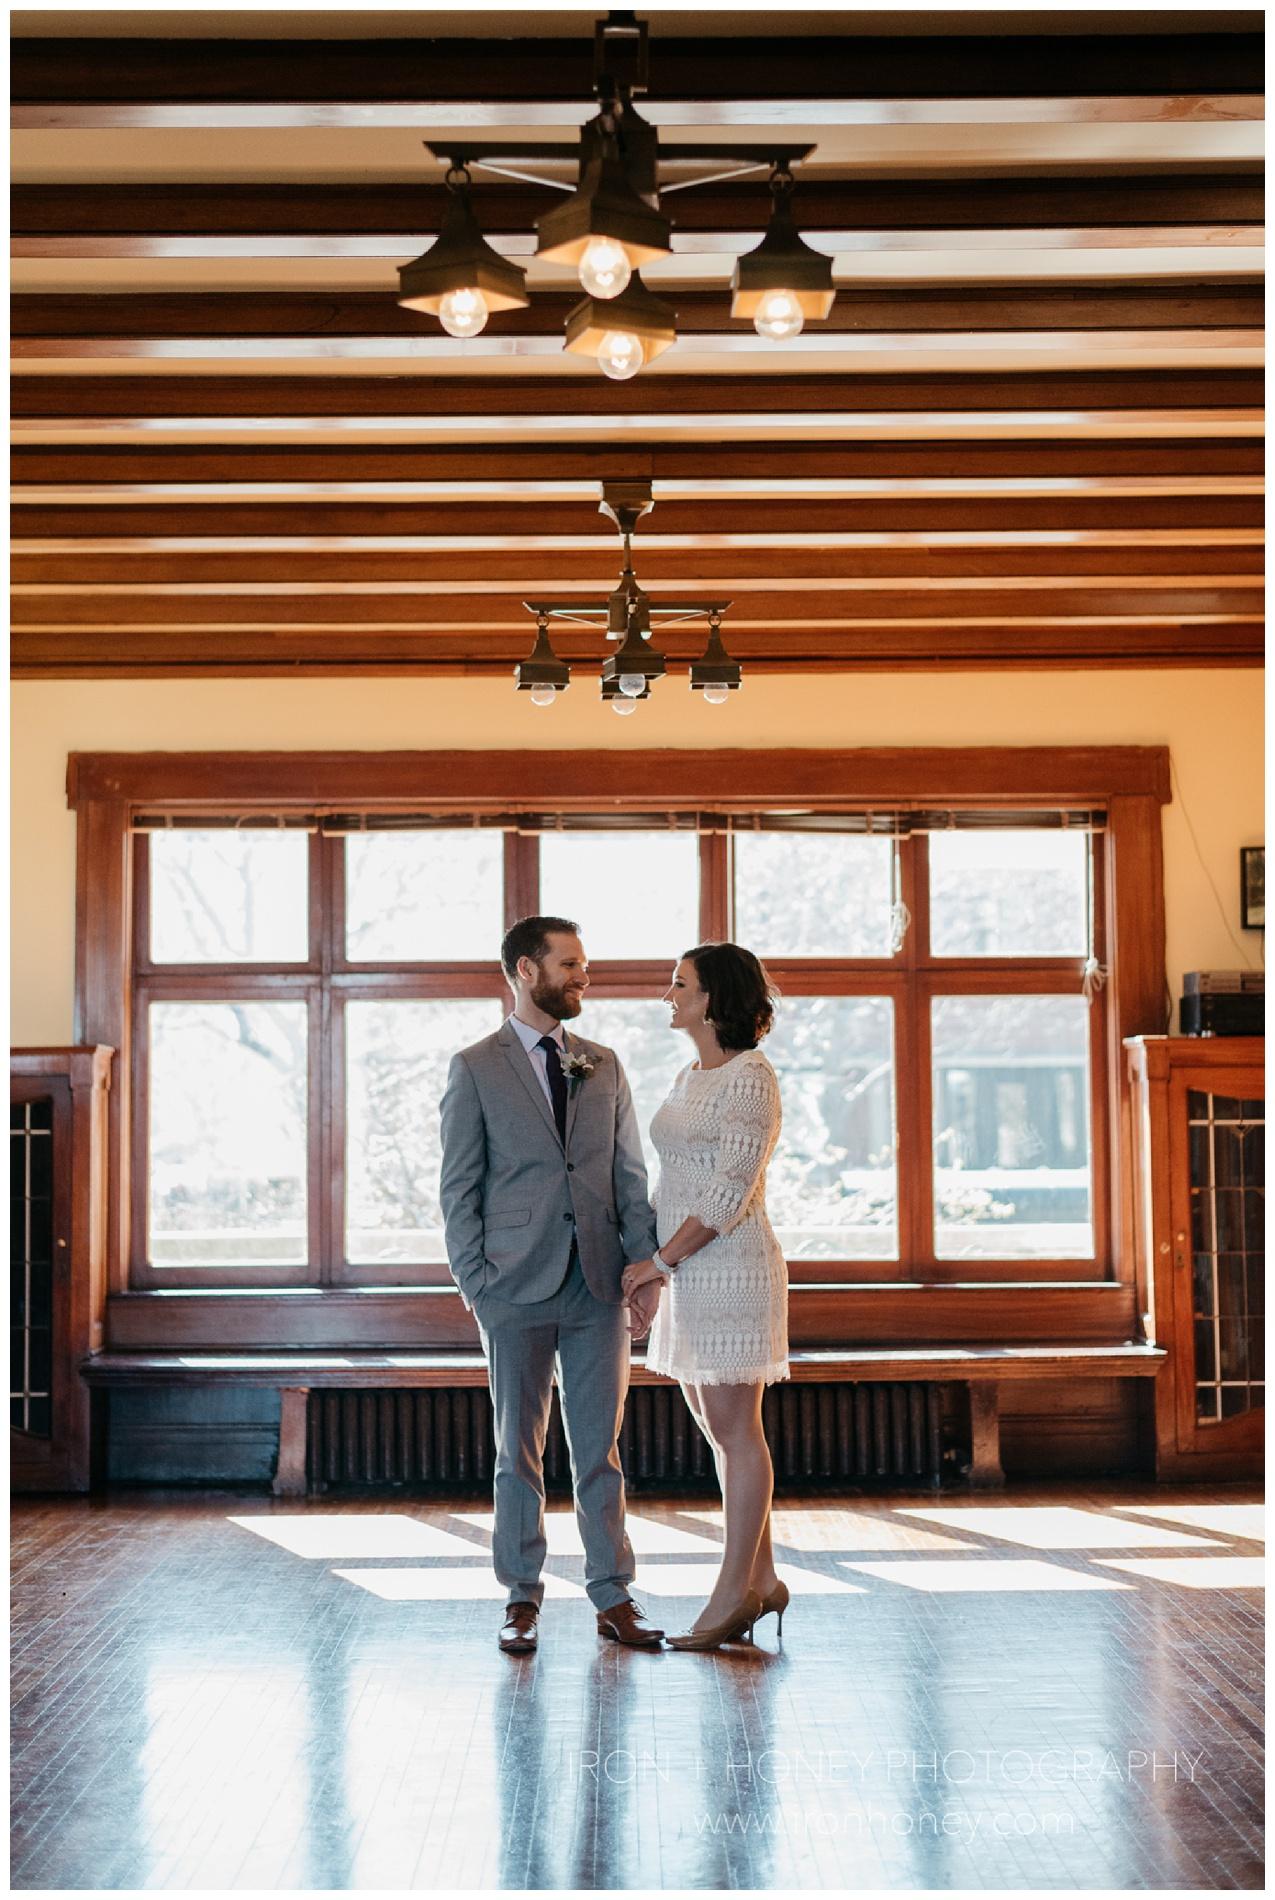 berger park cultural center, chicago, elopement, chicago elopement photographer, iron and honey photography, chicago wedding photographer, lake michigan